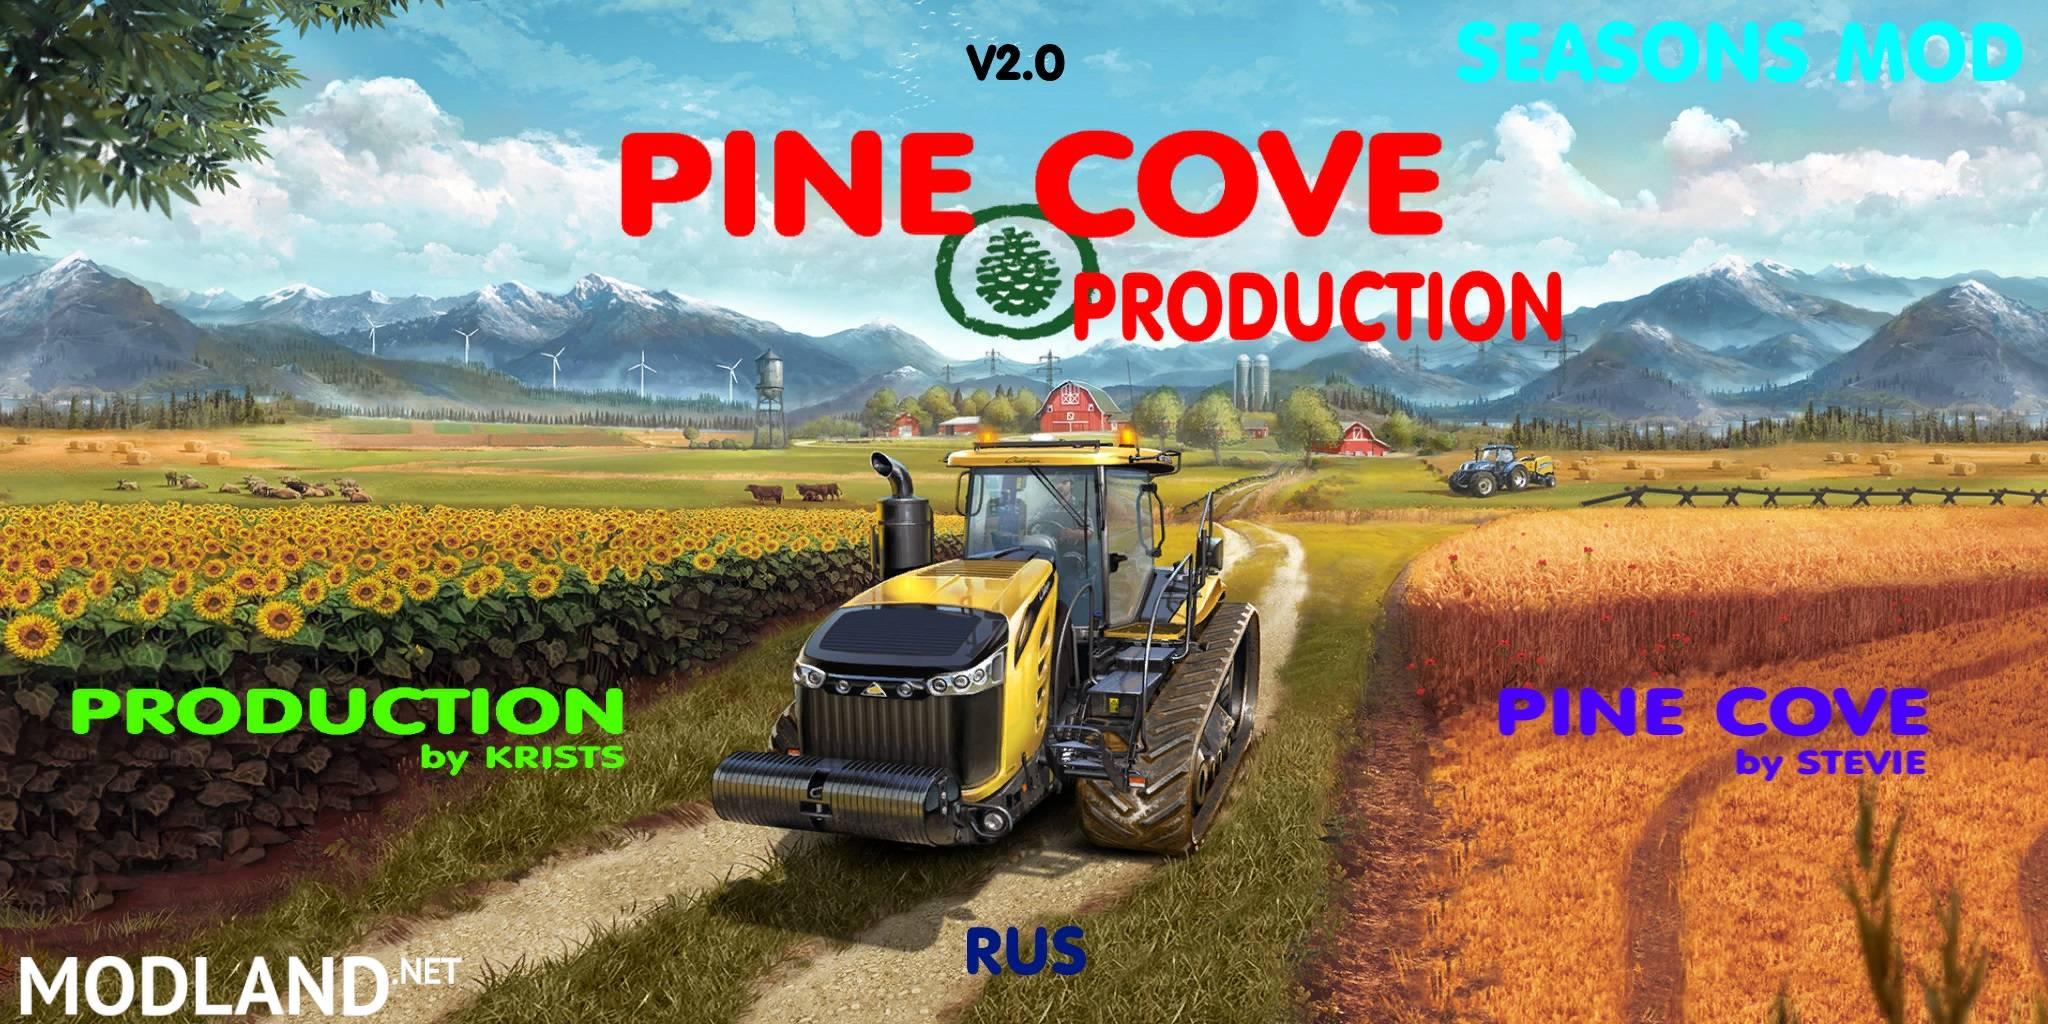 Pine Cove Production RUS v 2.0 mod Farming Simulator 17